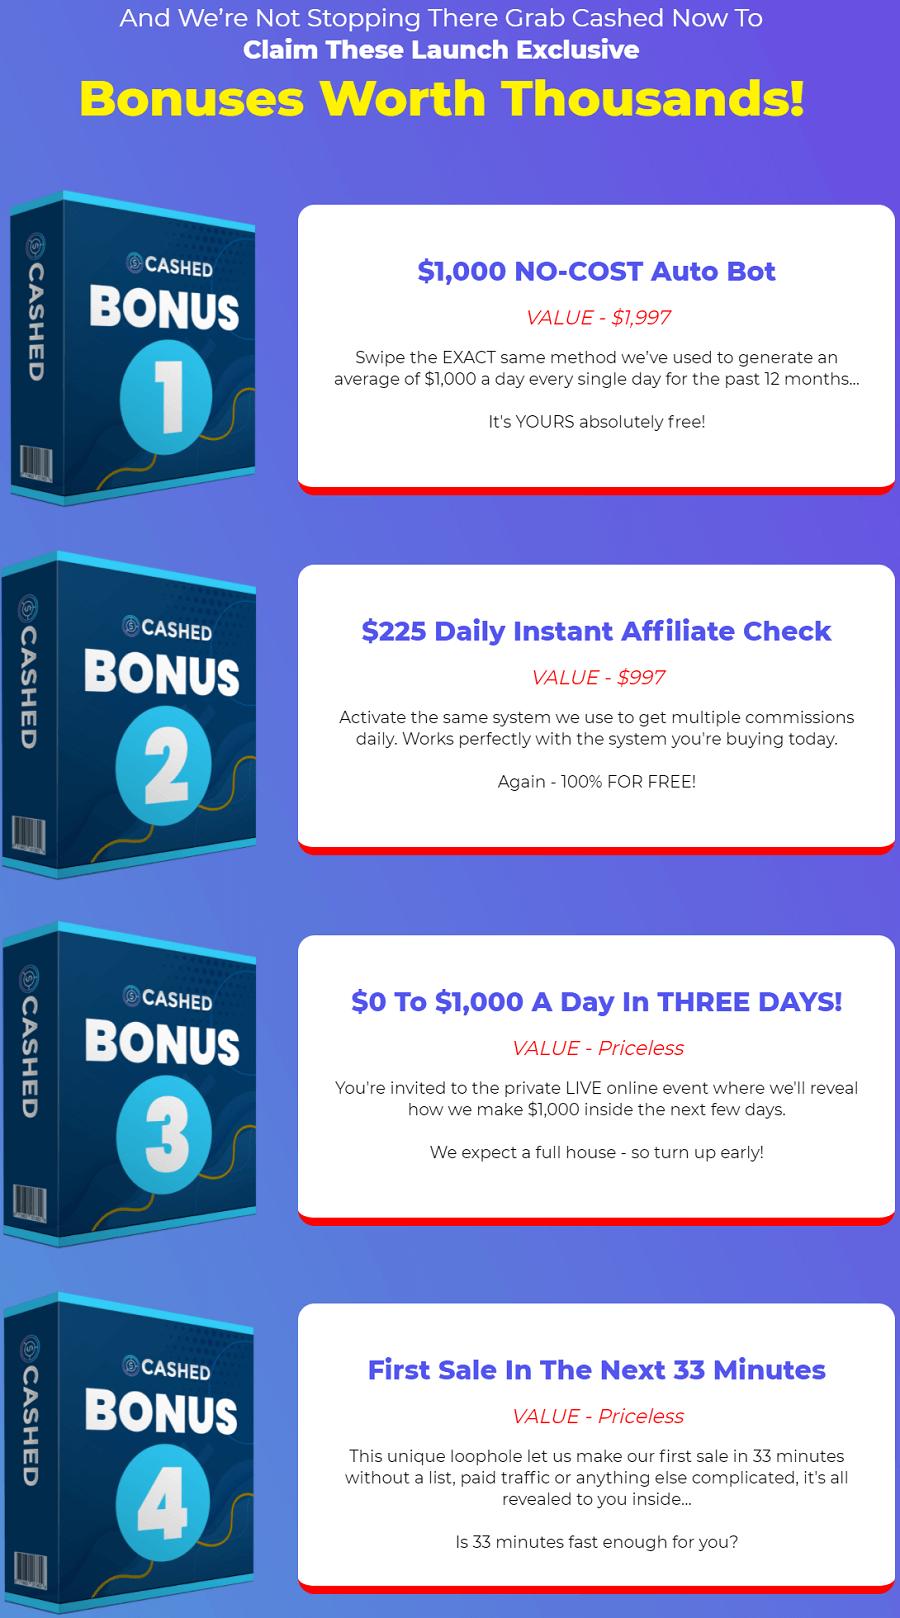 CASHED bonus